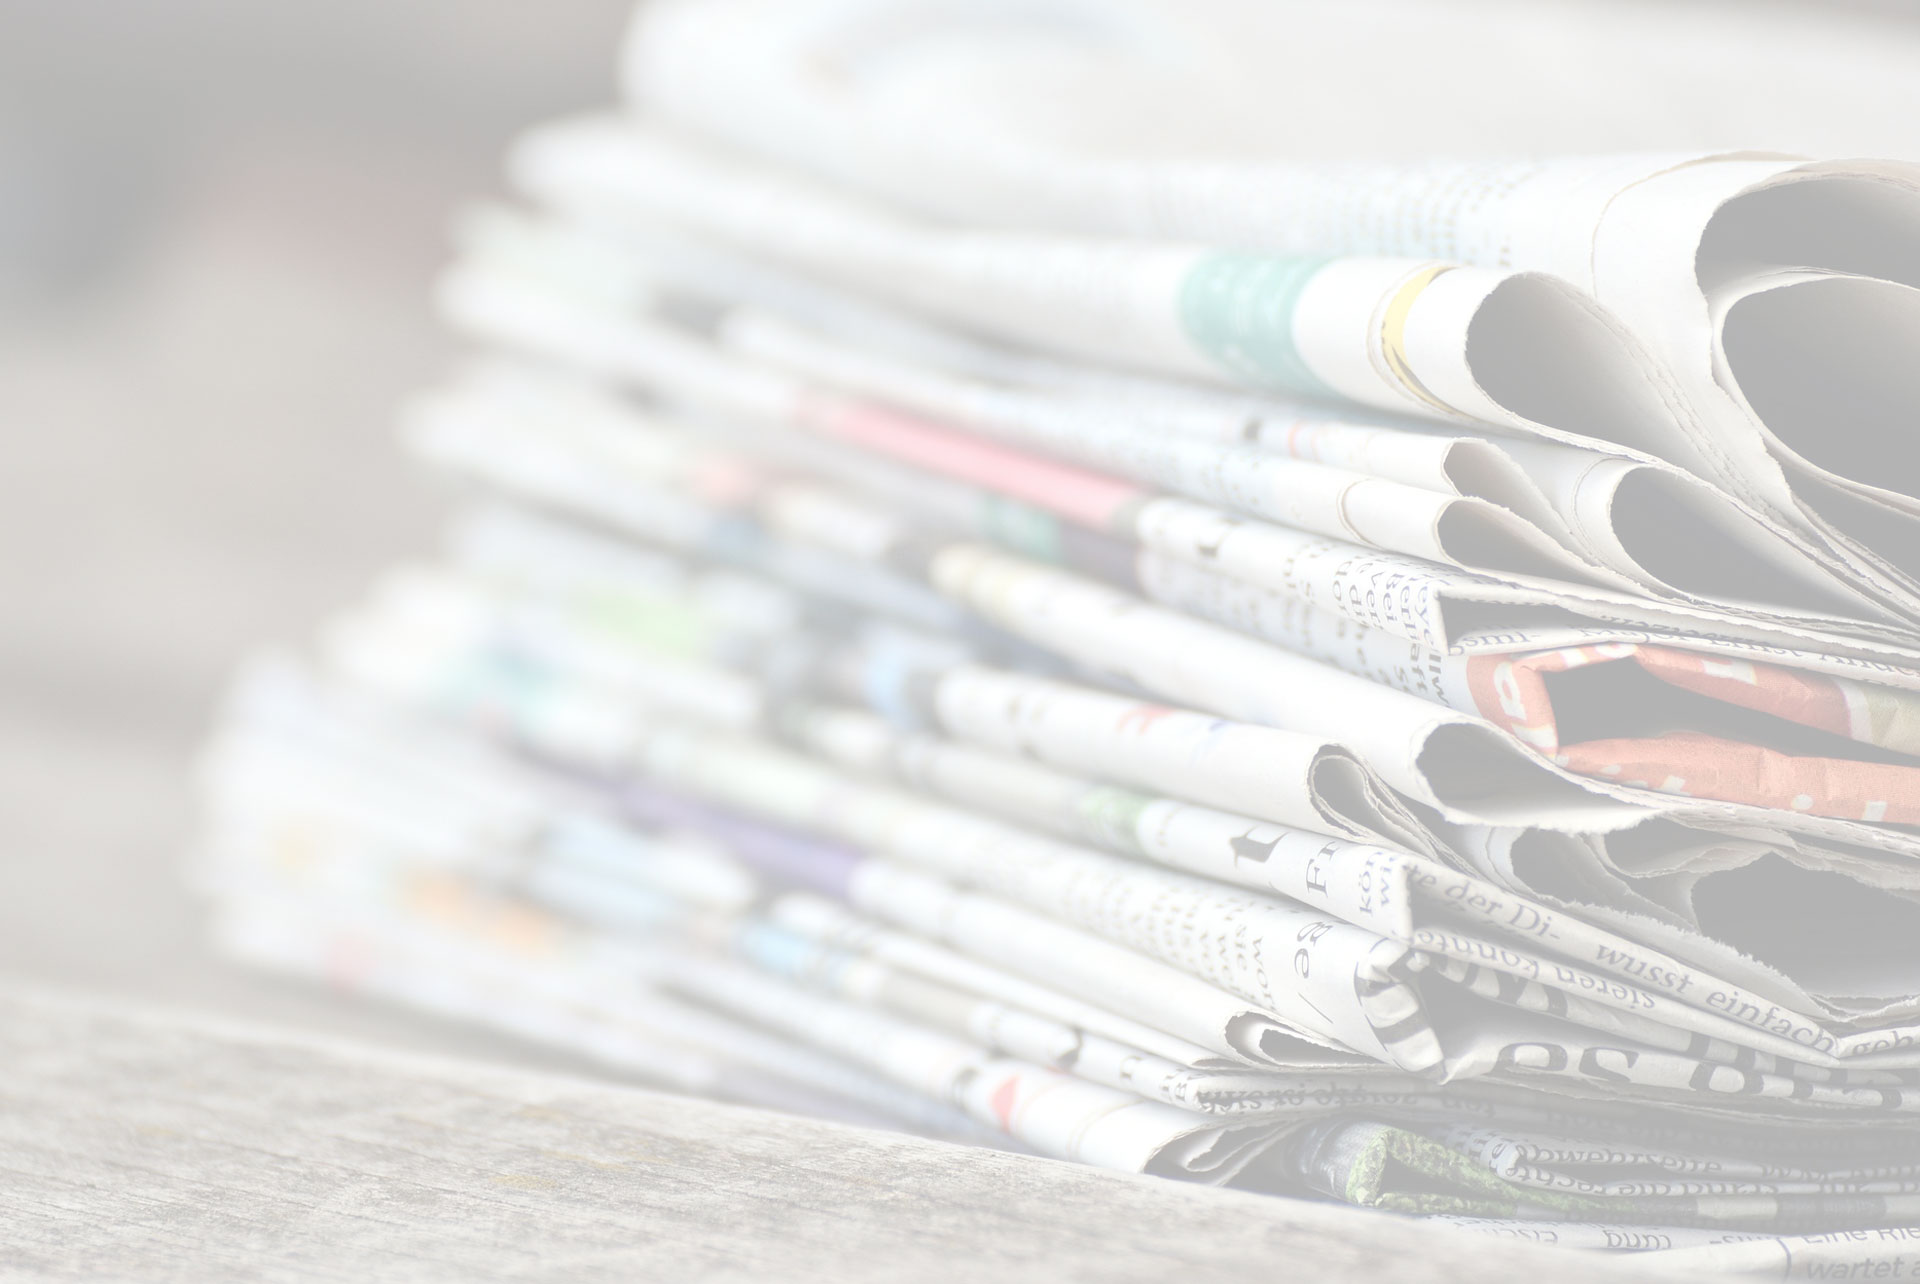 Elezioni in Nuova Zelanda |  Jacinda Ardern rieletta premier